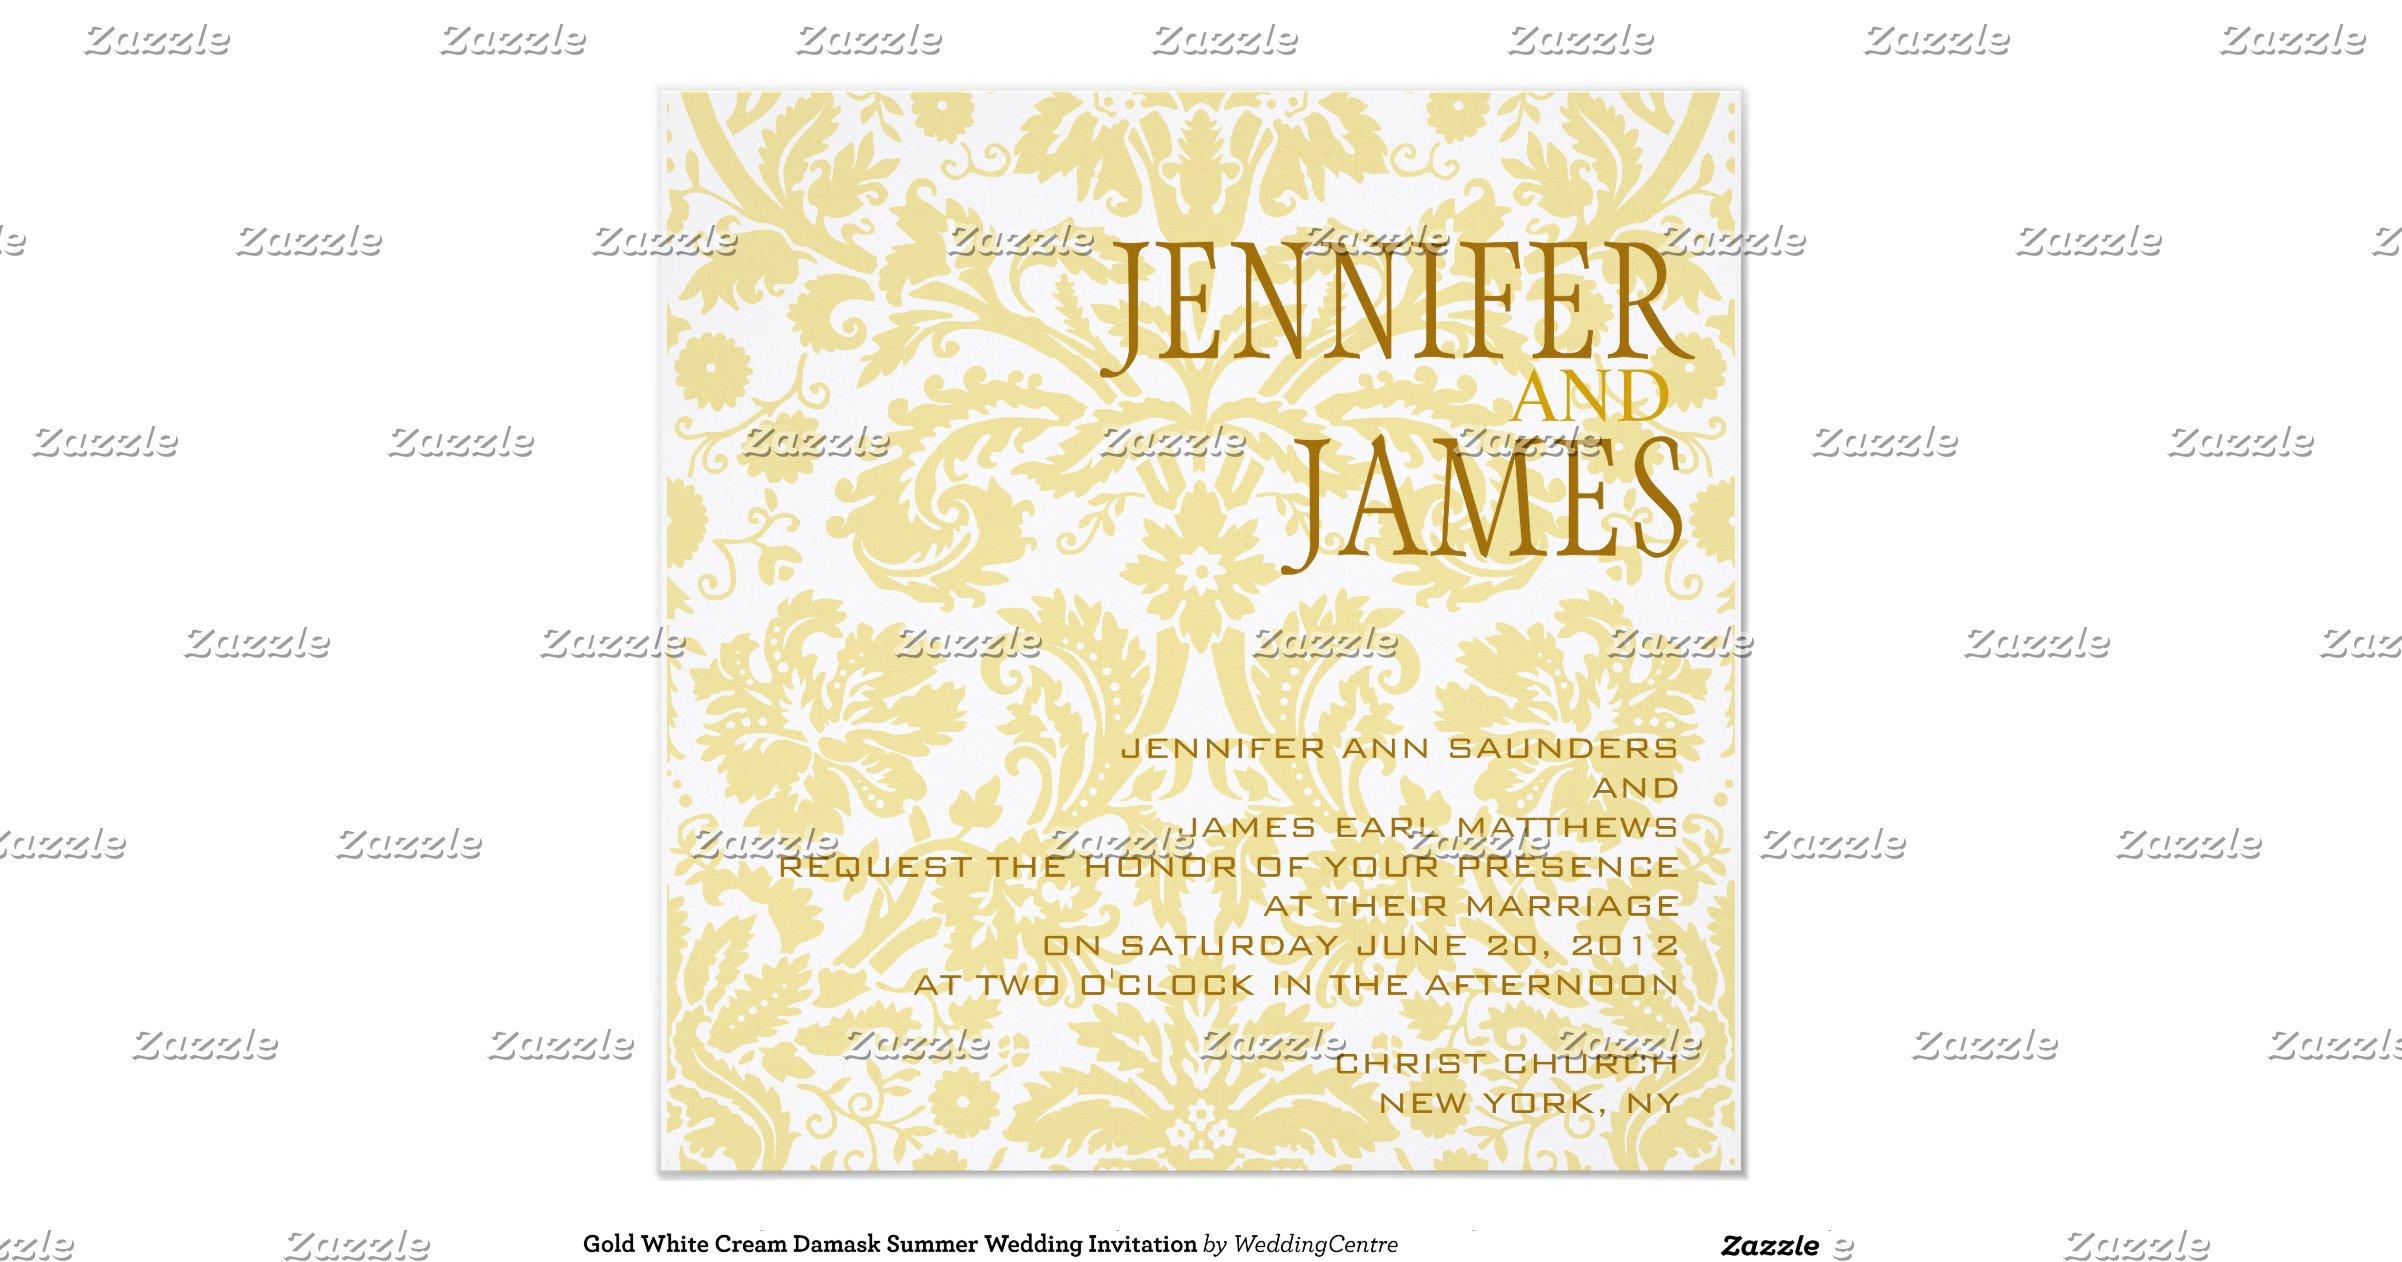 Cream And Gold Wedding Invitations: Gold_white_cream_damask_summer_wedding_invitation